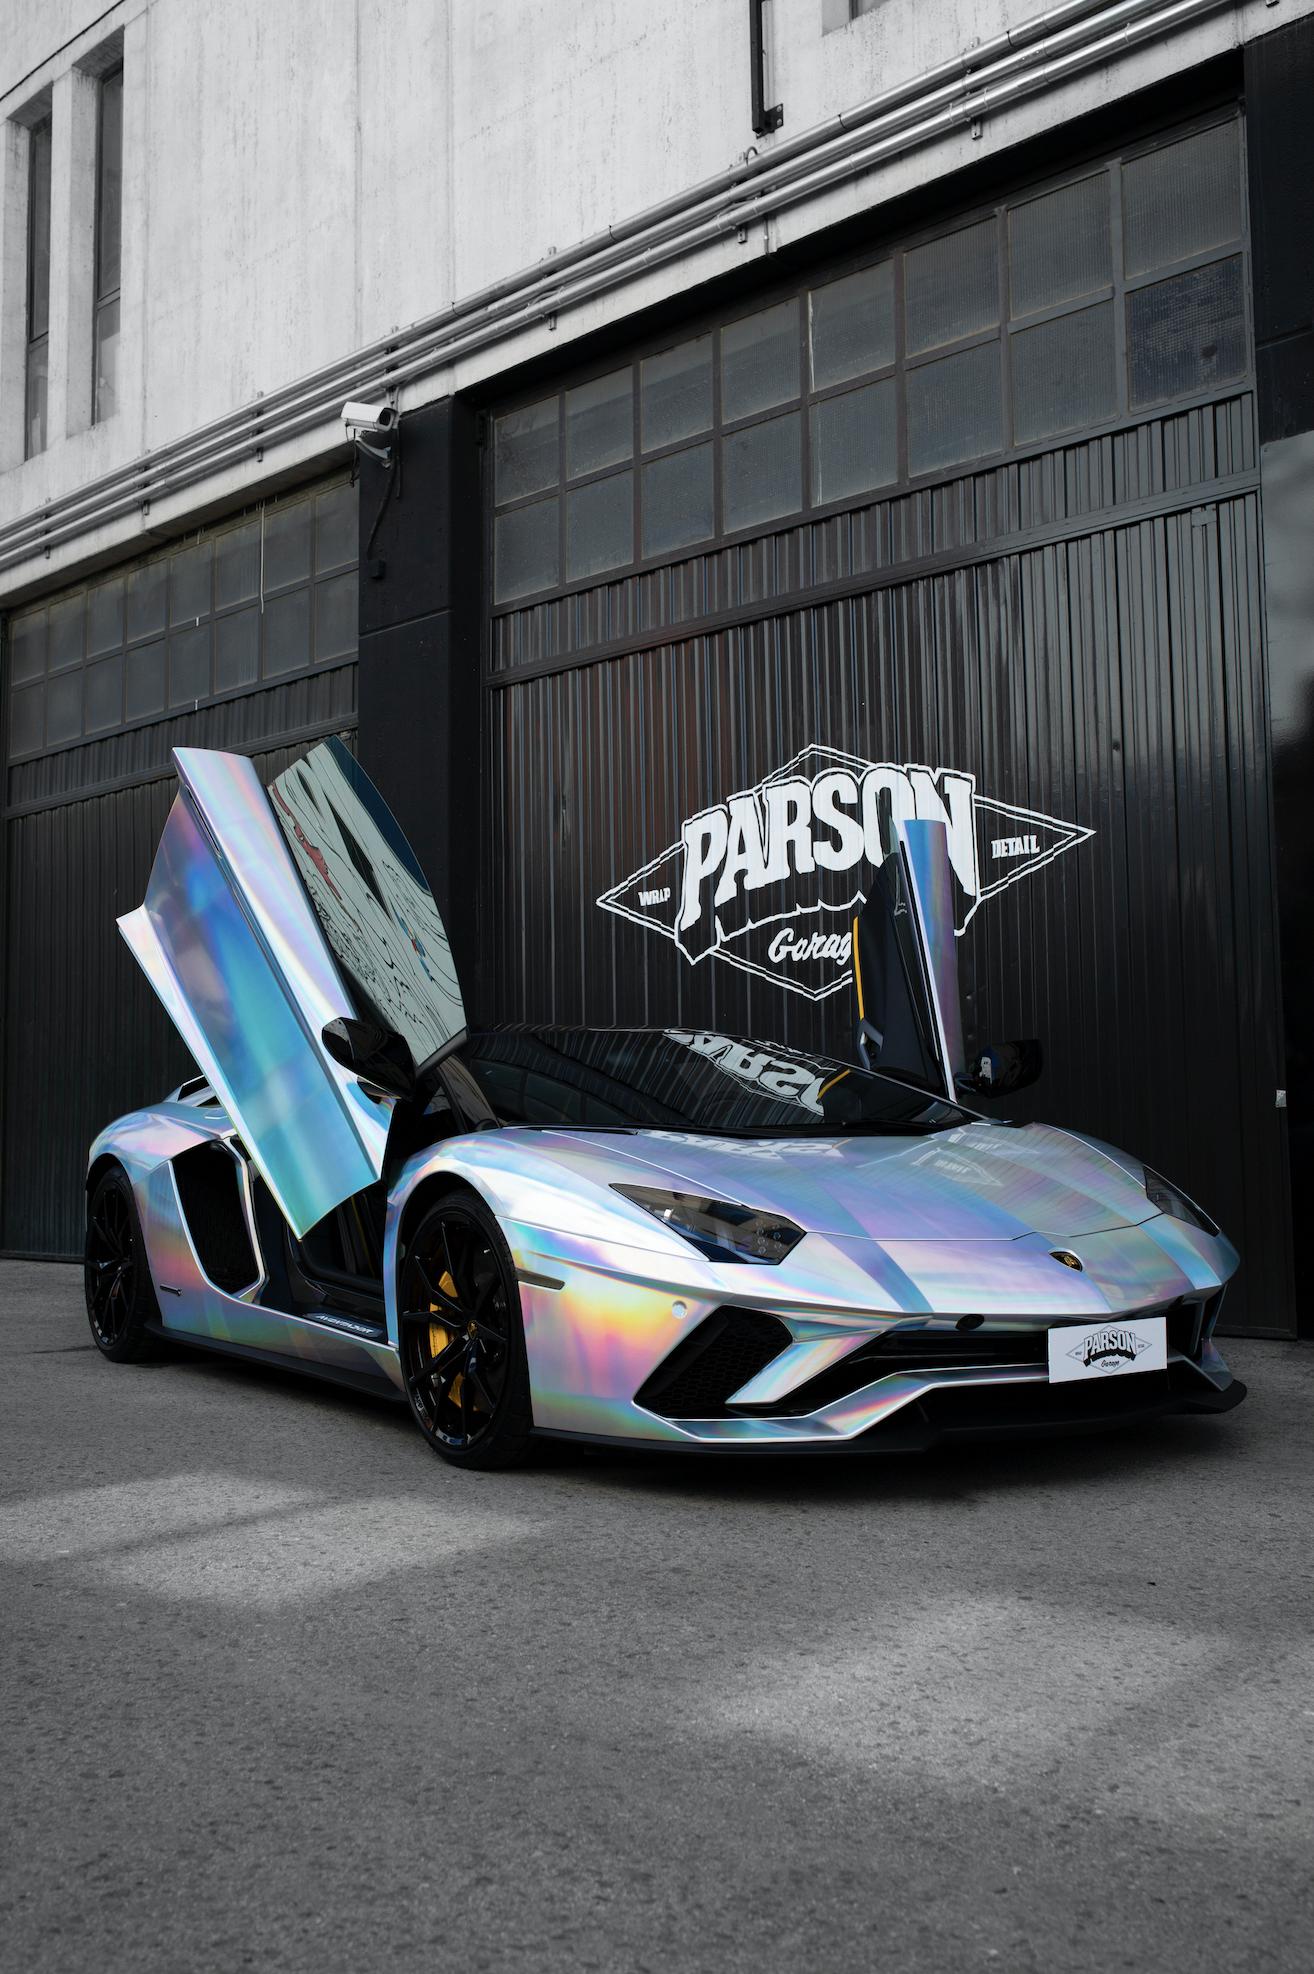 Lamborghini Aventador S Holographic Chrome by Parson Garage #Ferrari #lamborghiniaventador